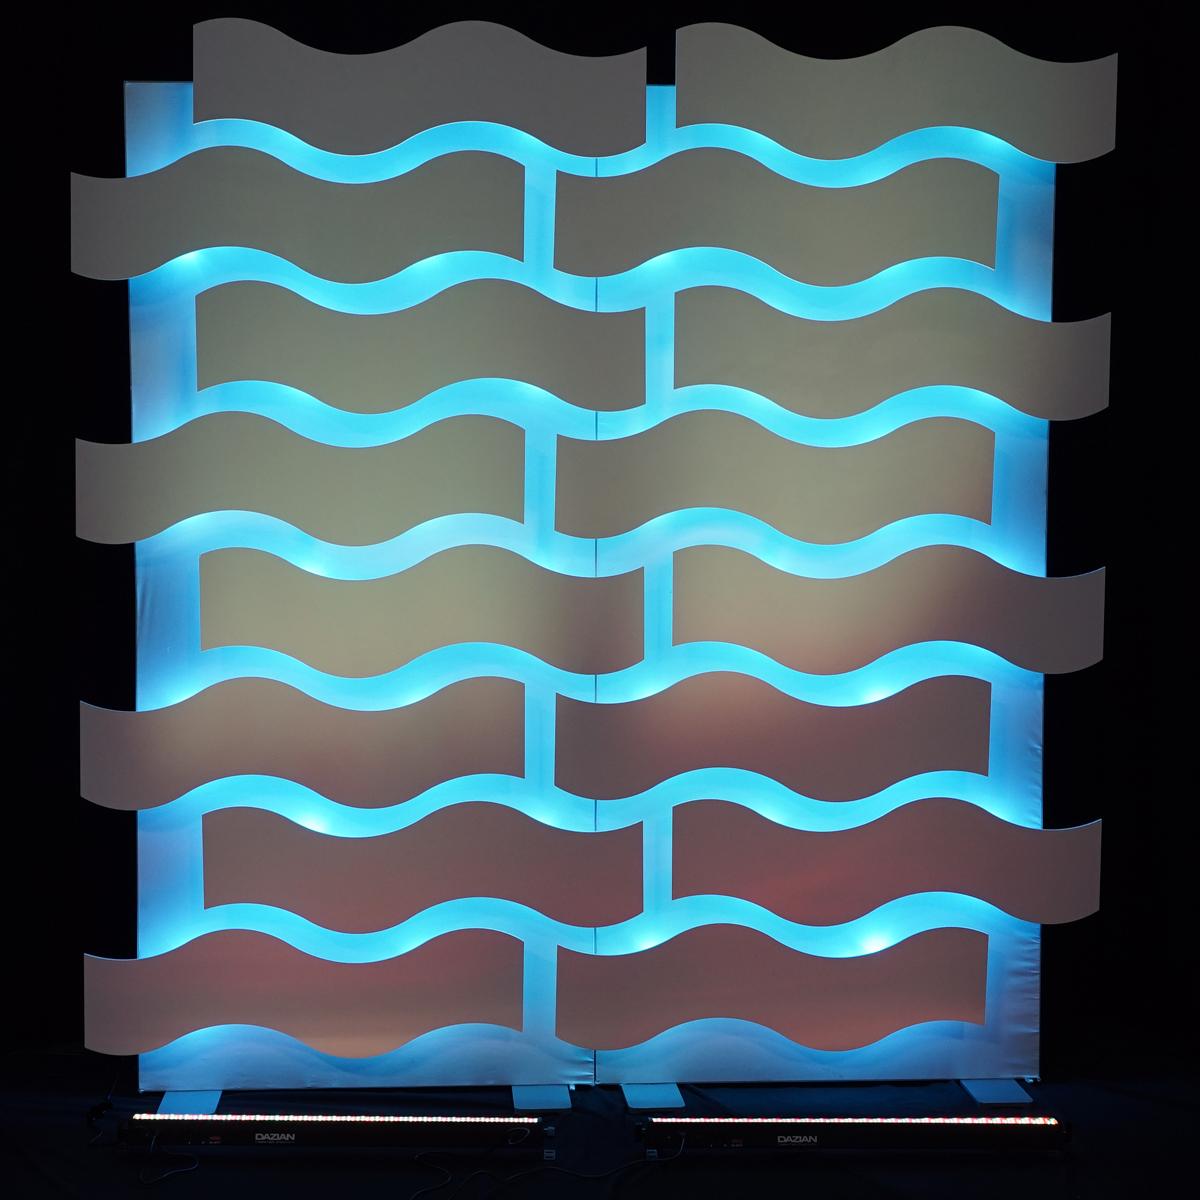 MAG-LED Walls™ & Halo Tile Kits - Dazian